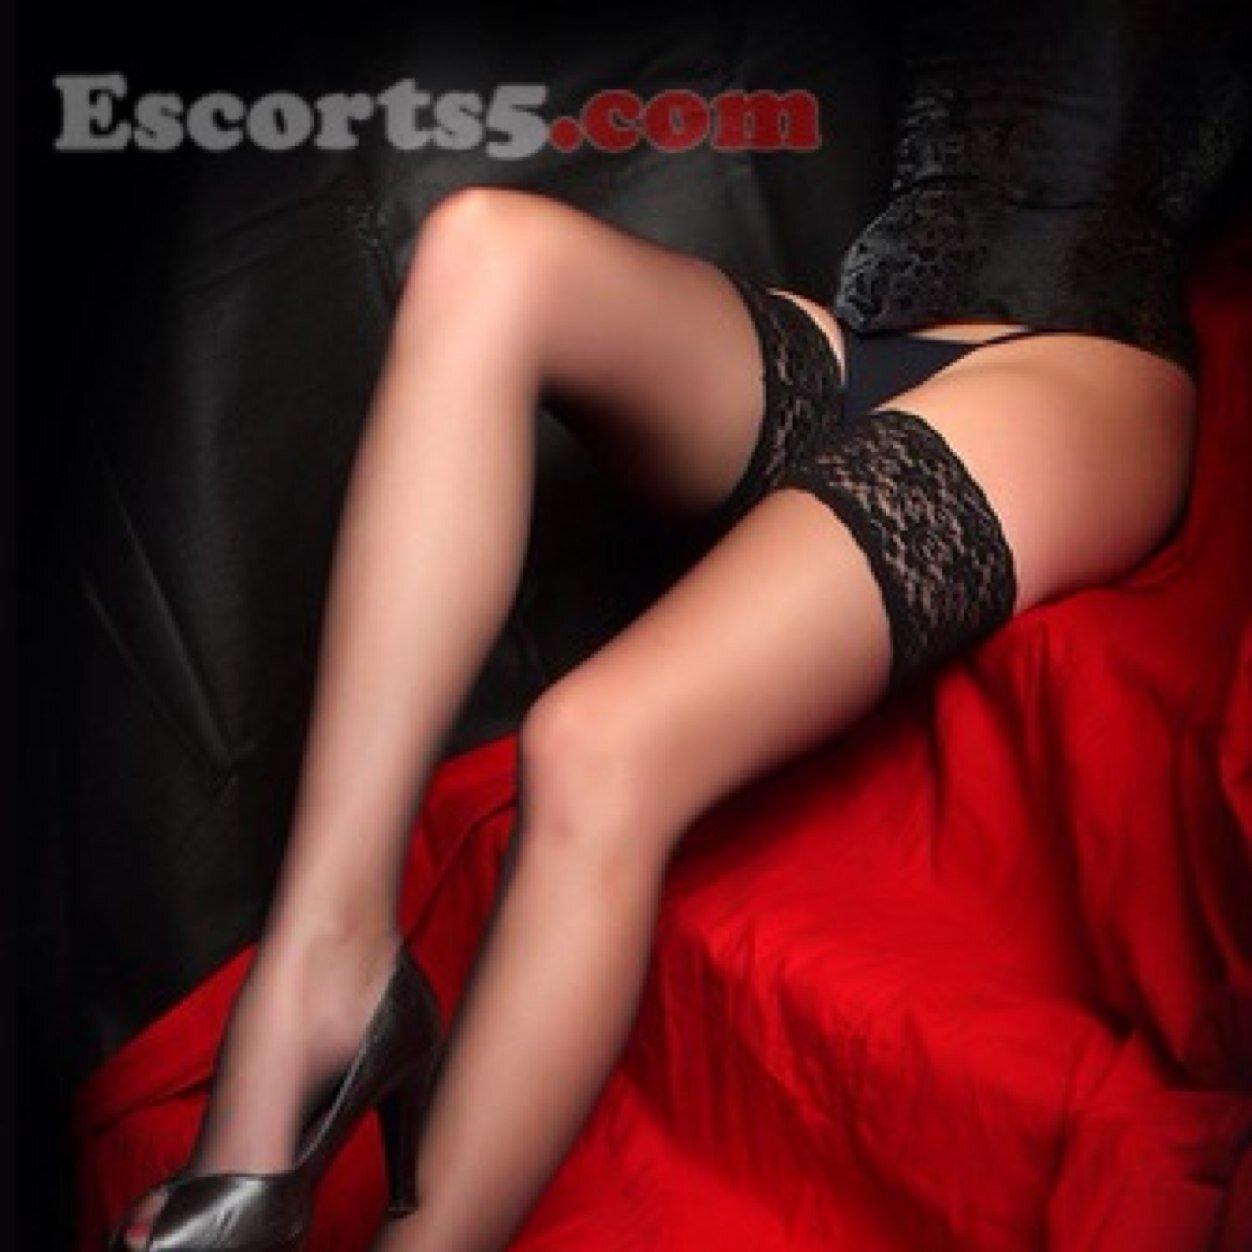 @escorts05